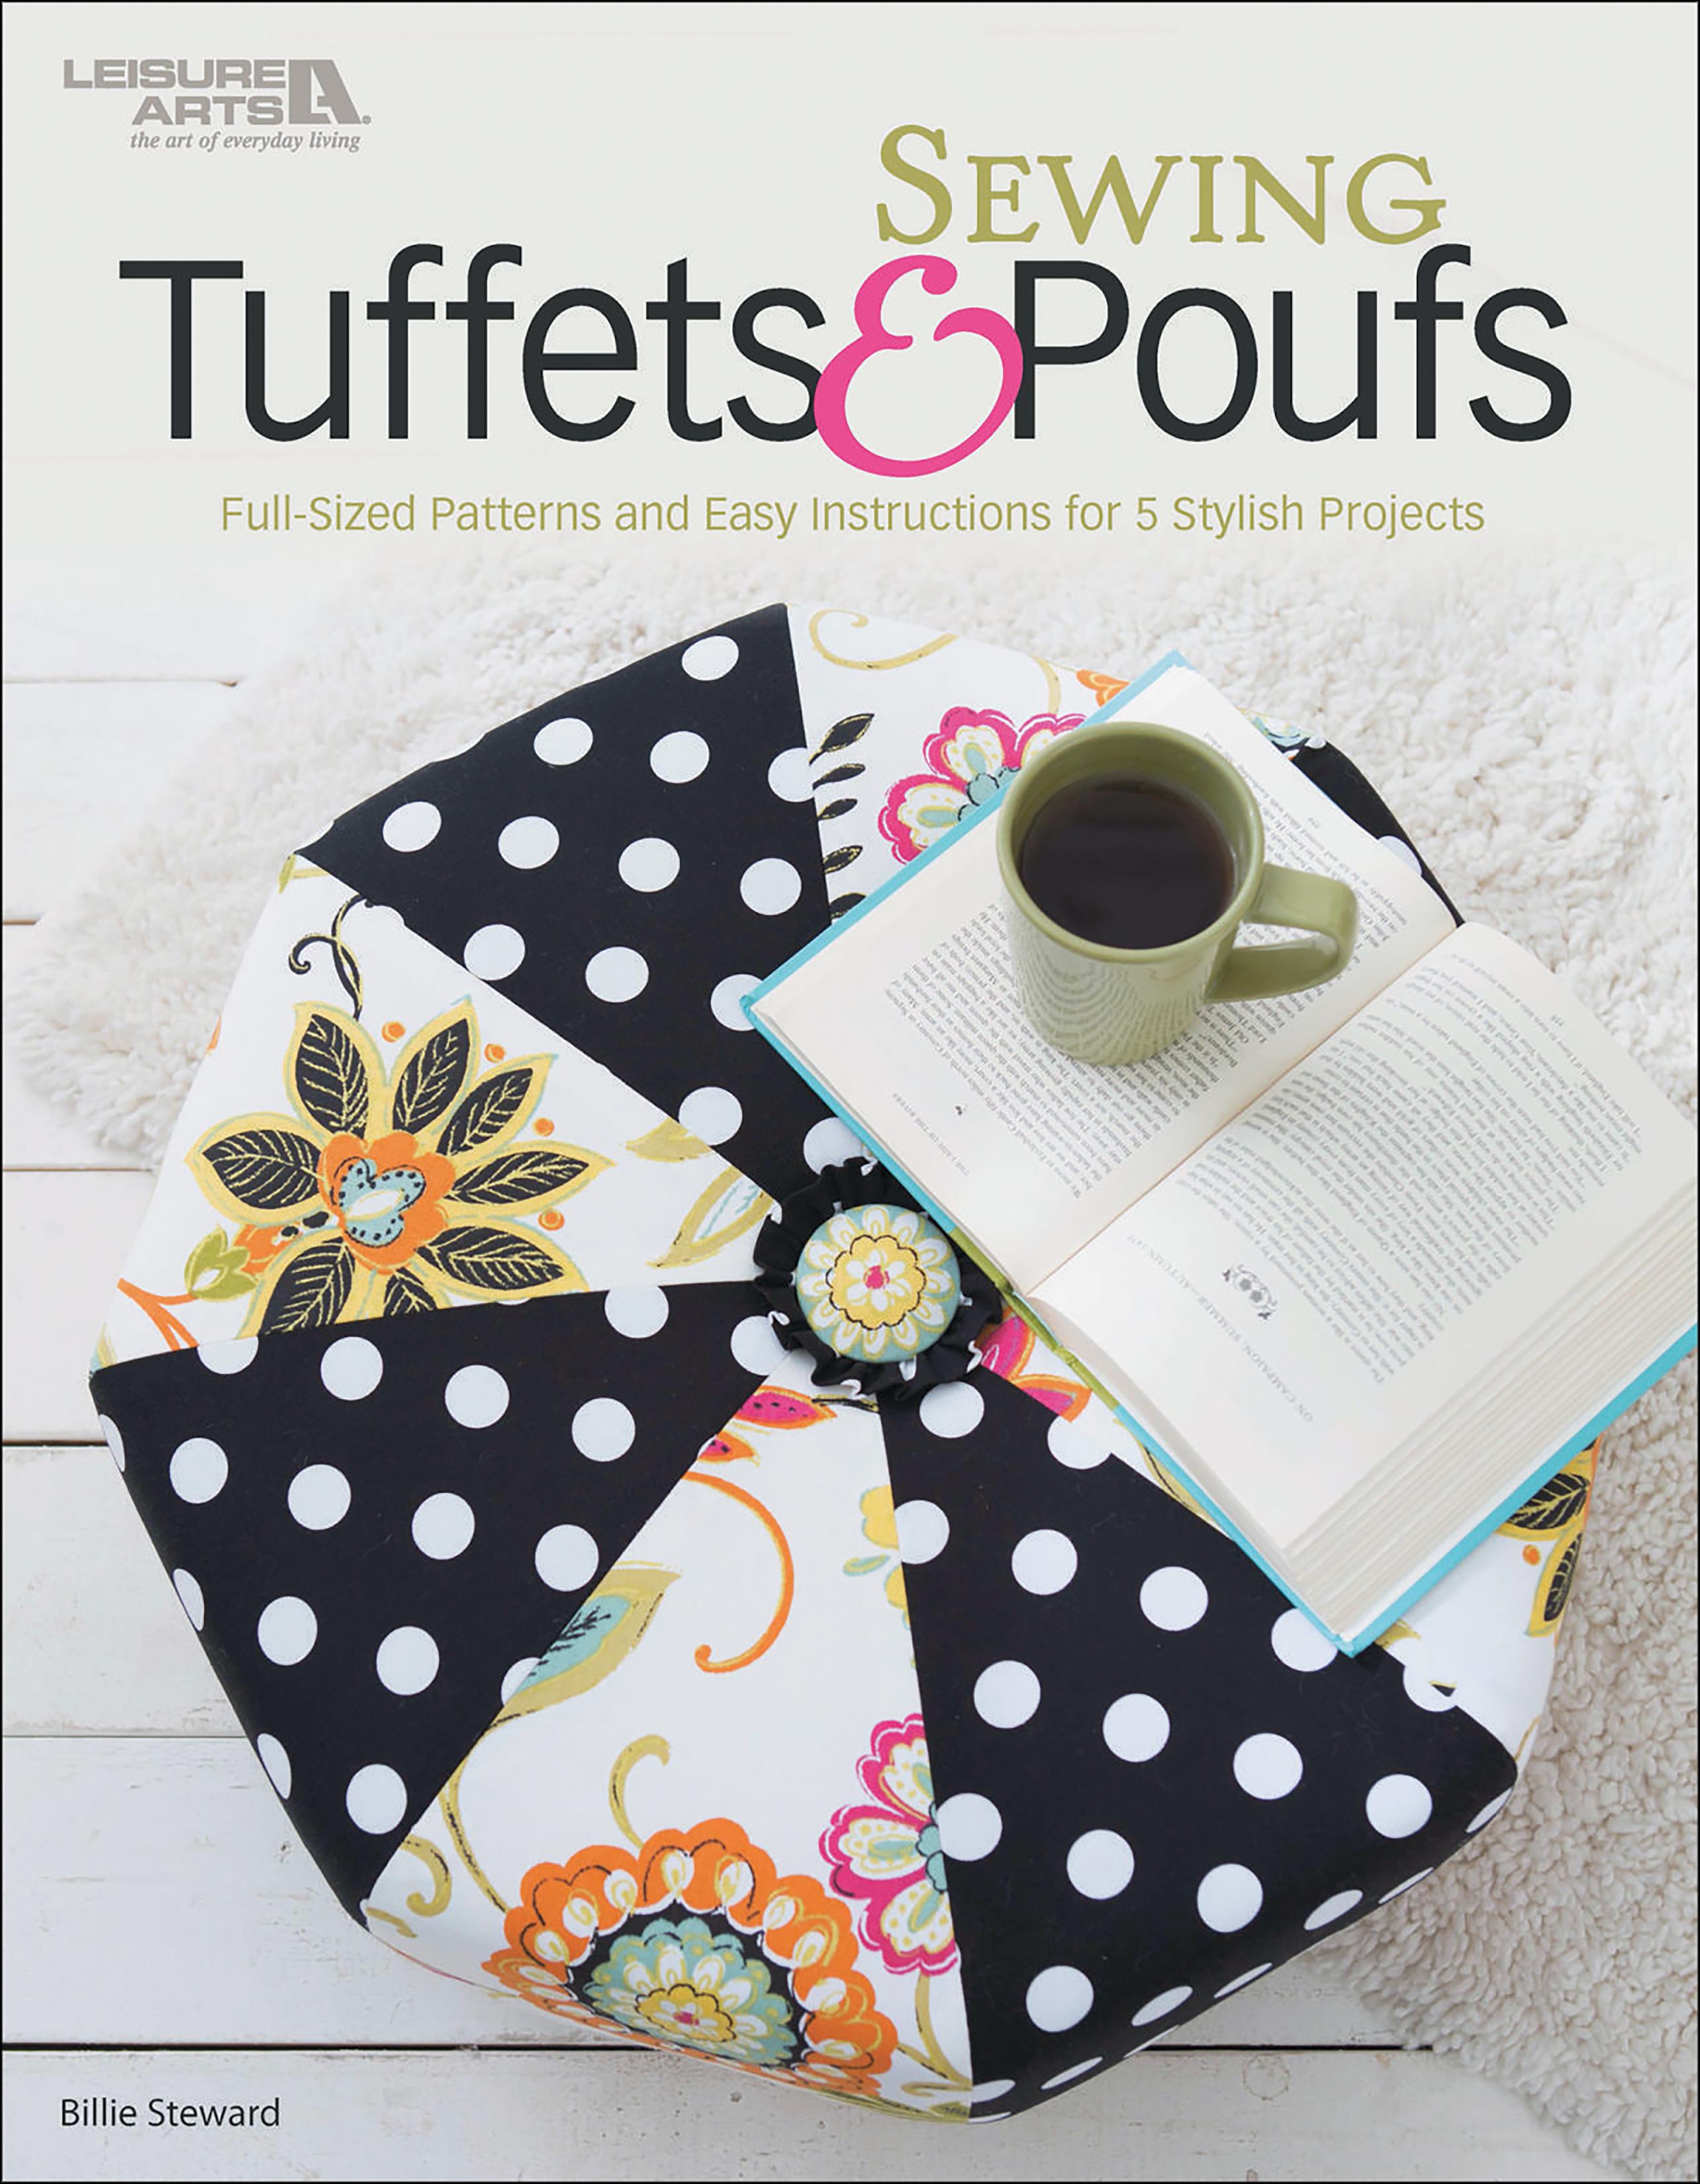 Leisure Arts-Sewing Tuffets & Poufs